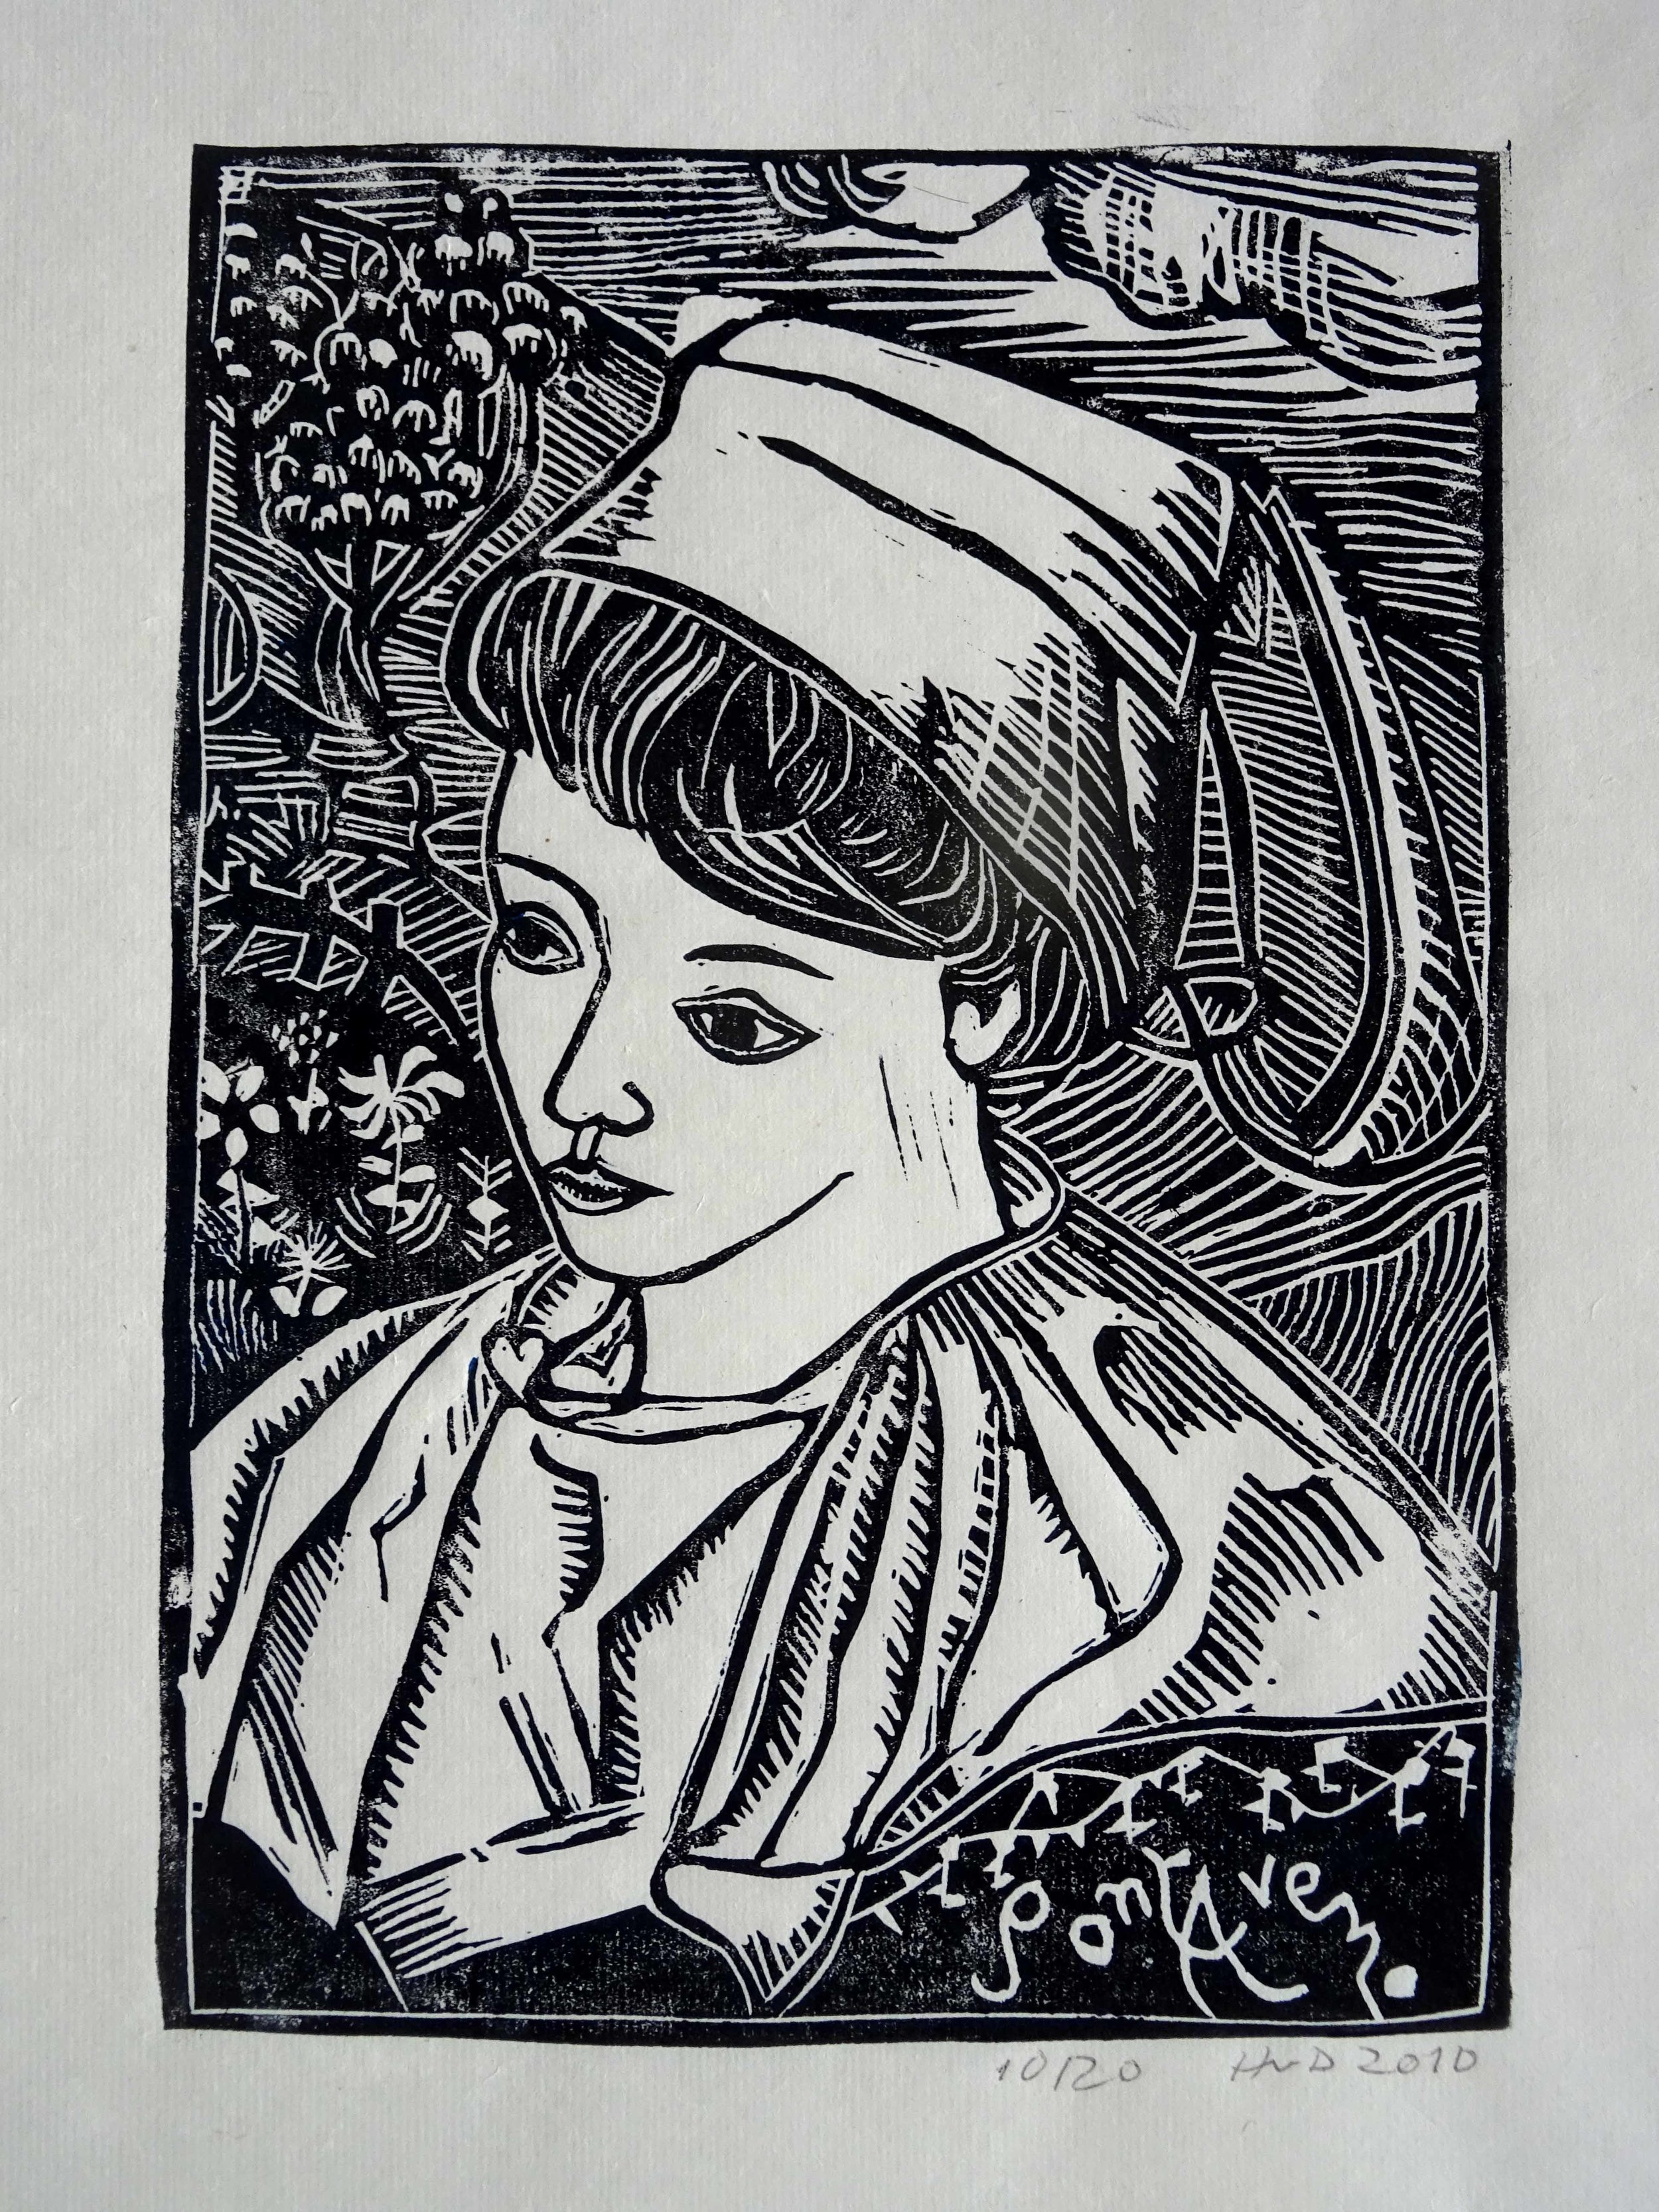 63 - Bretonne de Pont-Aven, lino 23x16 cm on rice paper (45g), 40 €